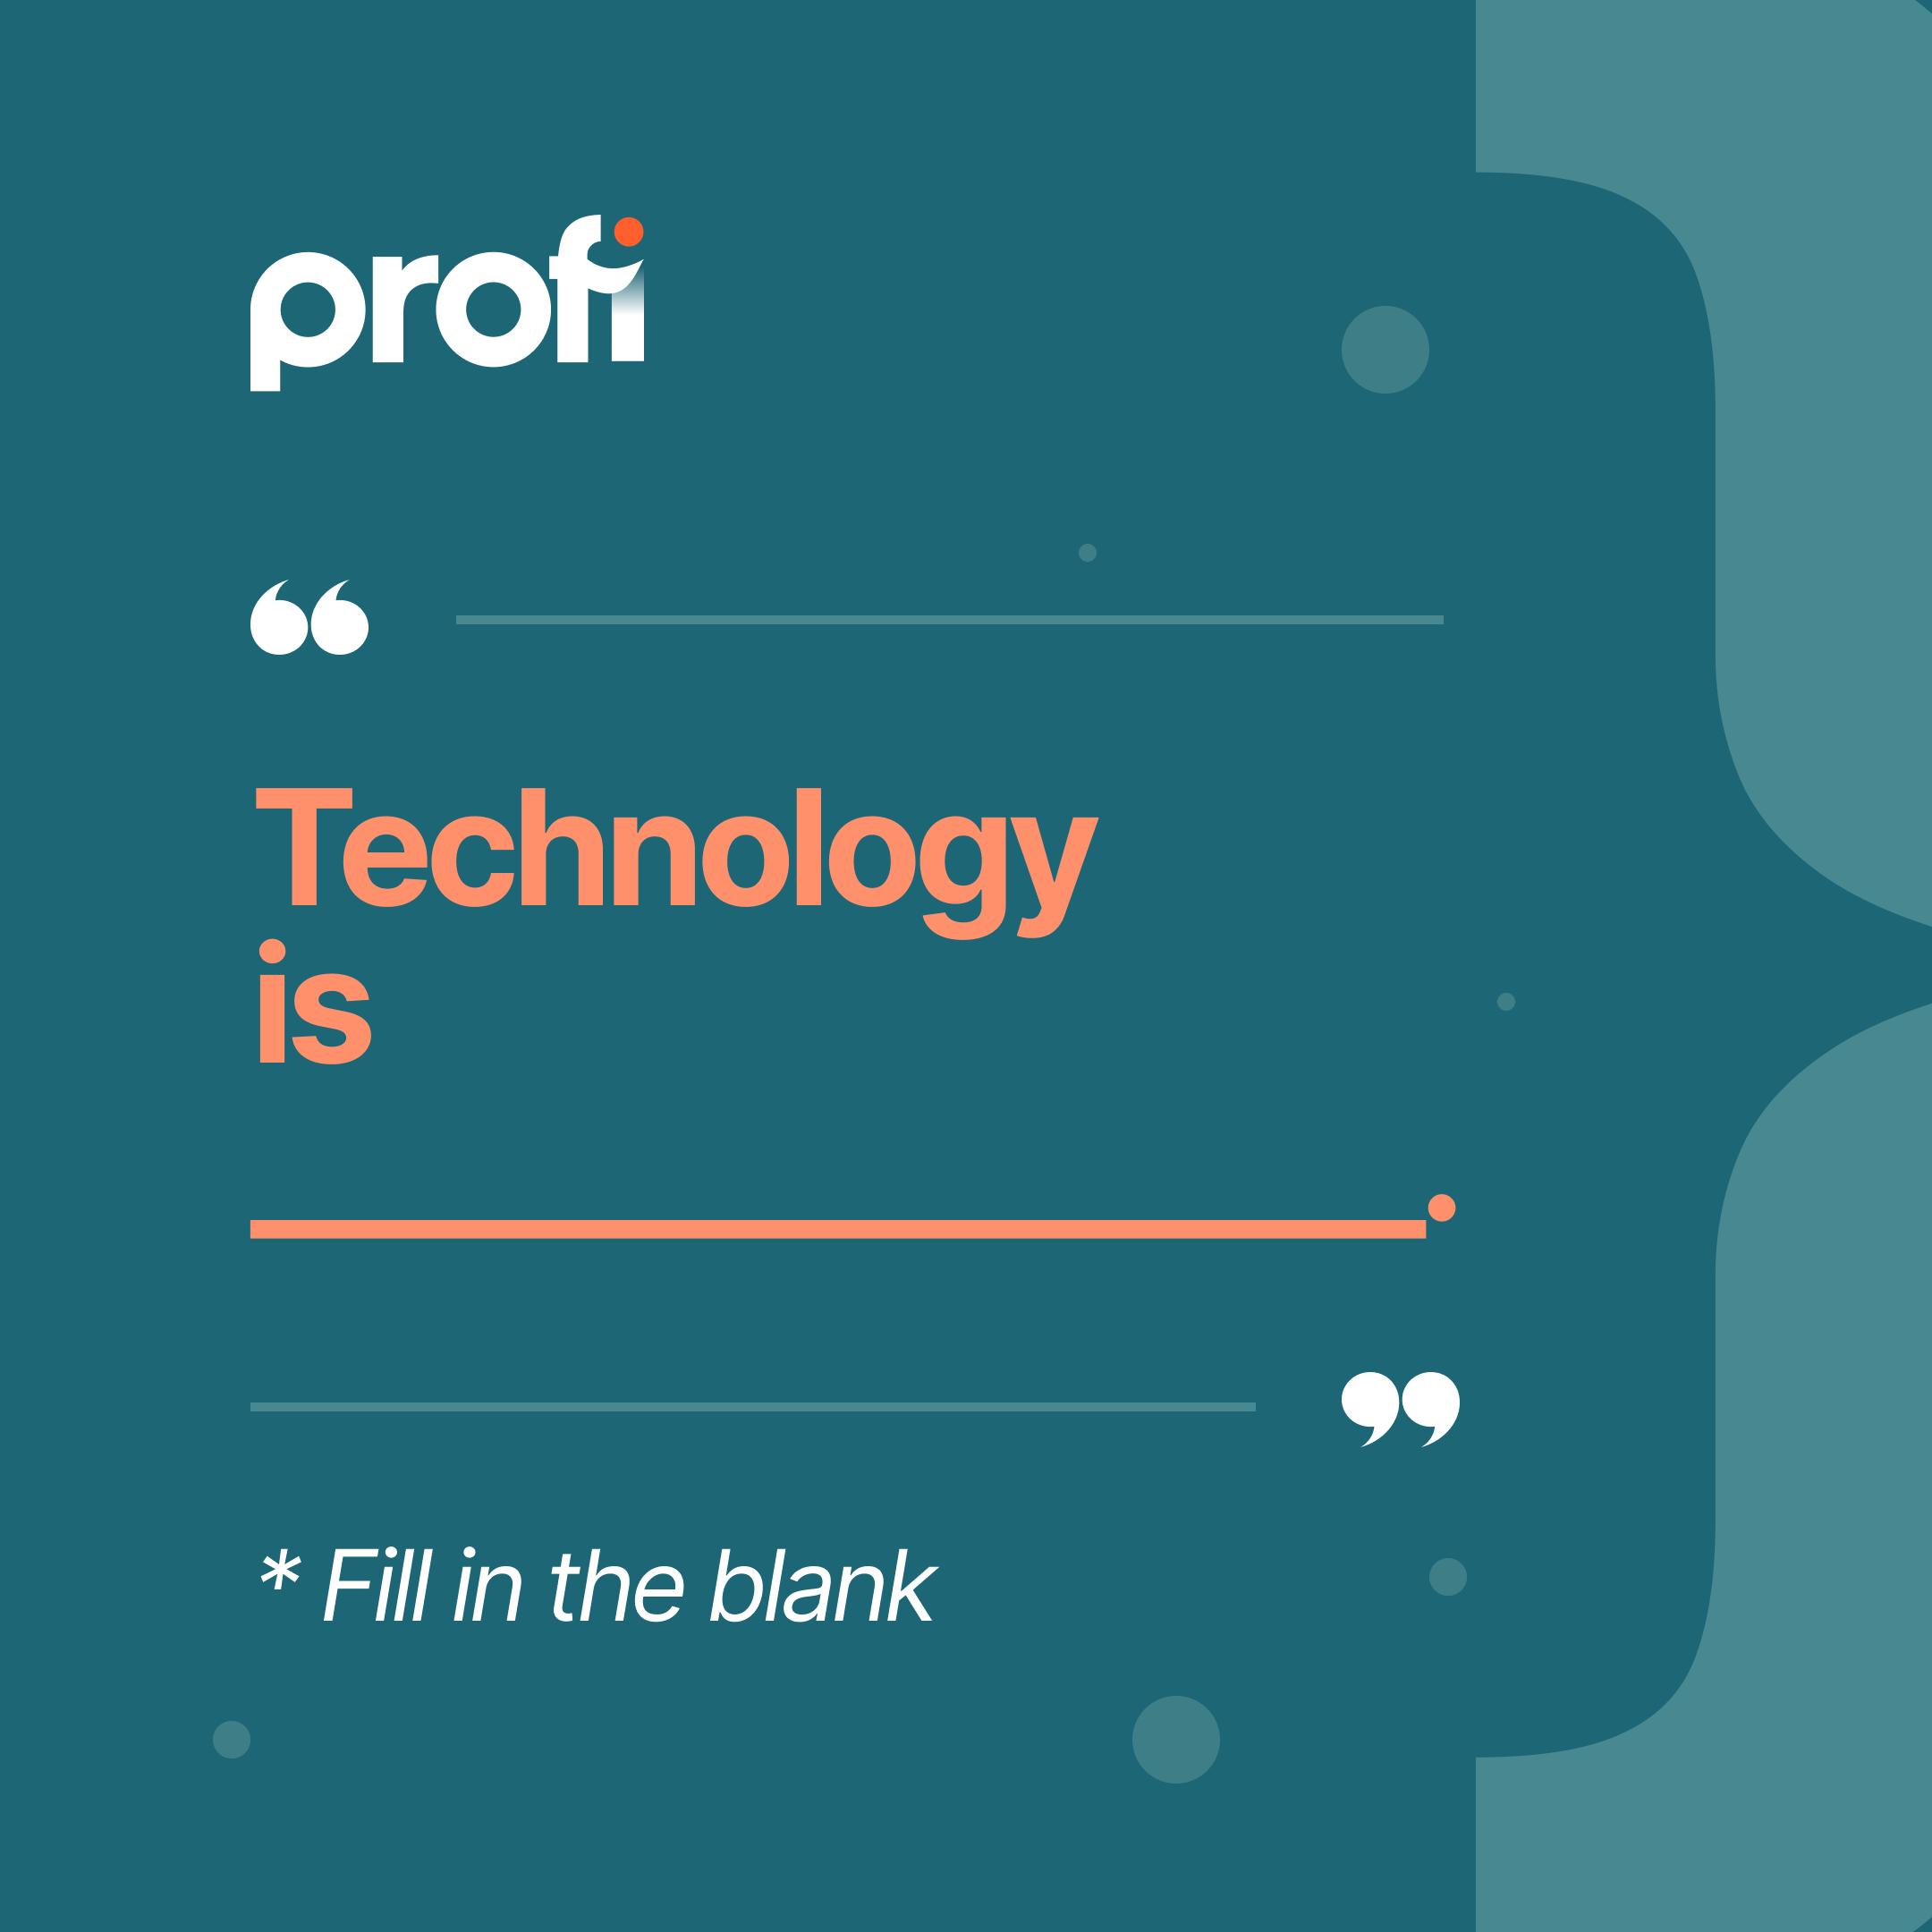 Self-reflective question for professional service providers | Profi platform for consultants